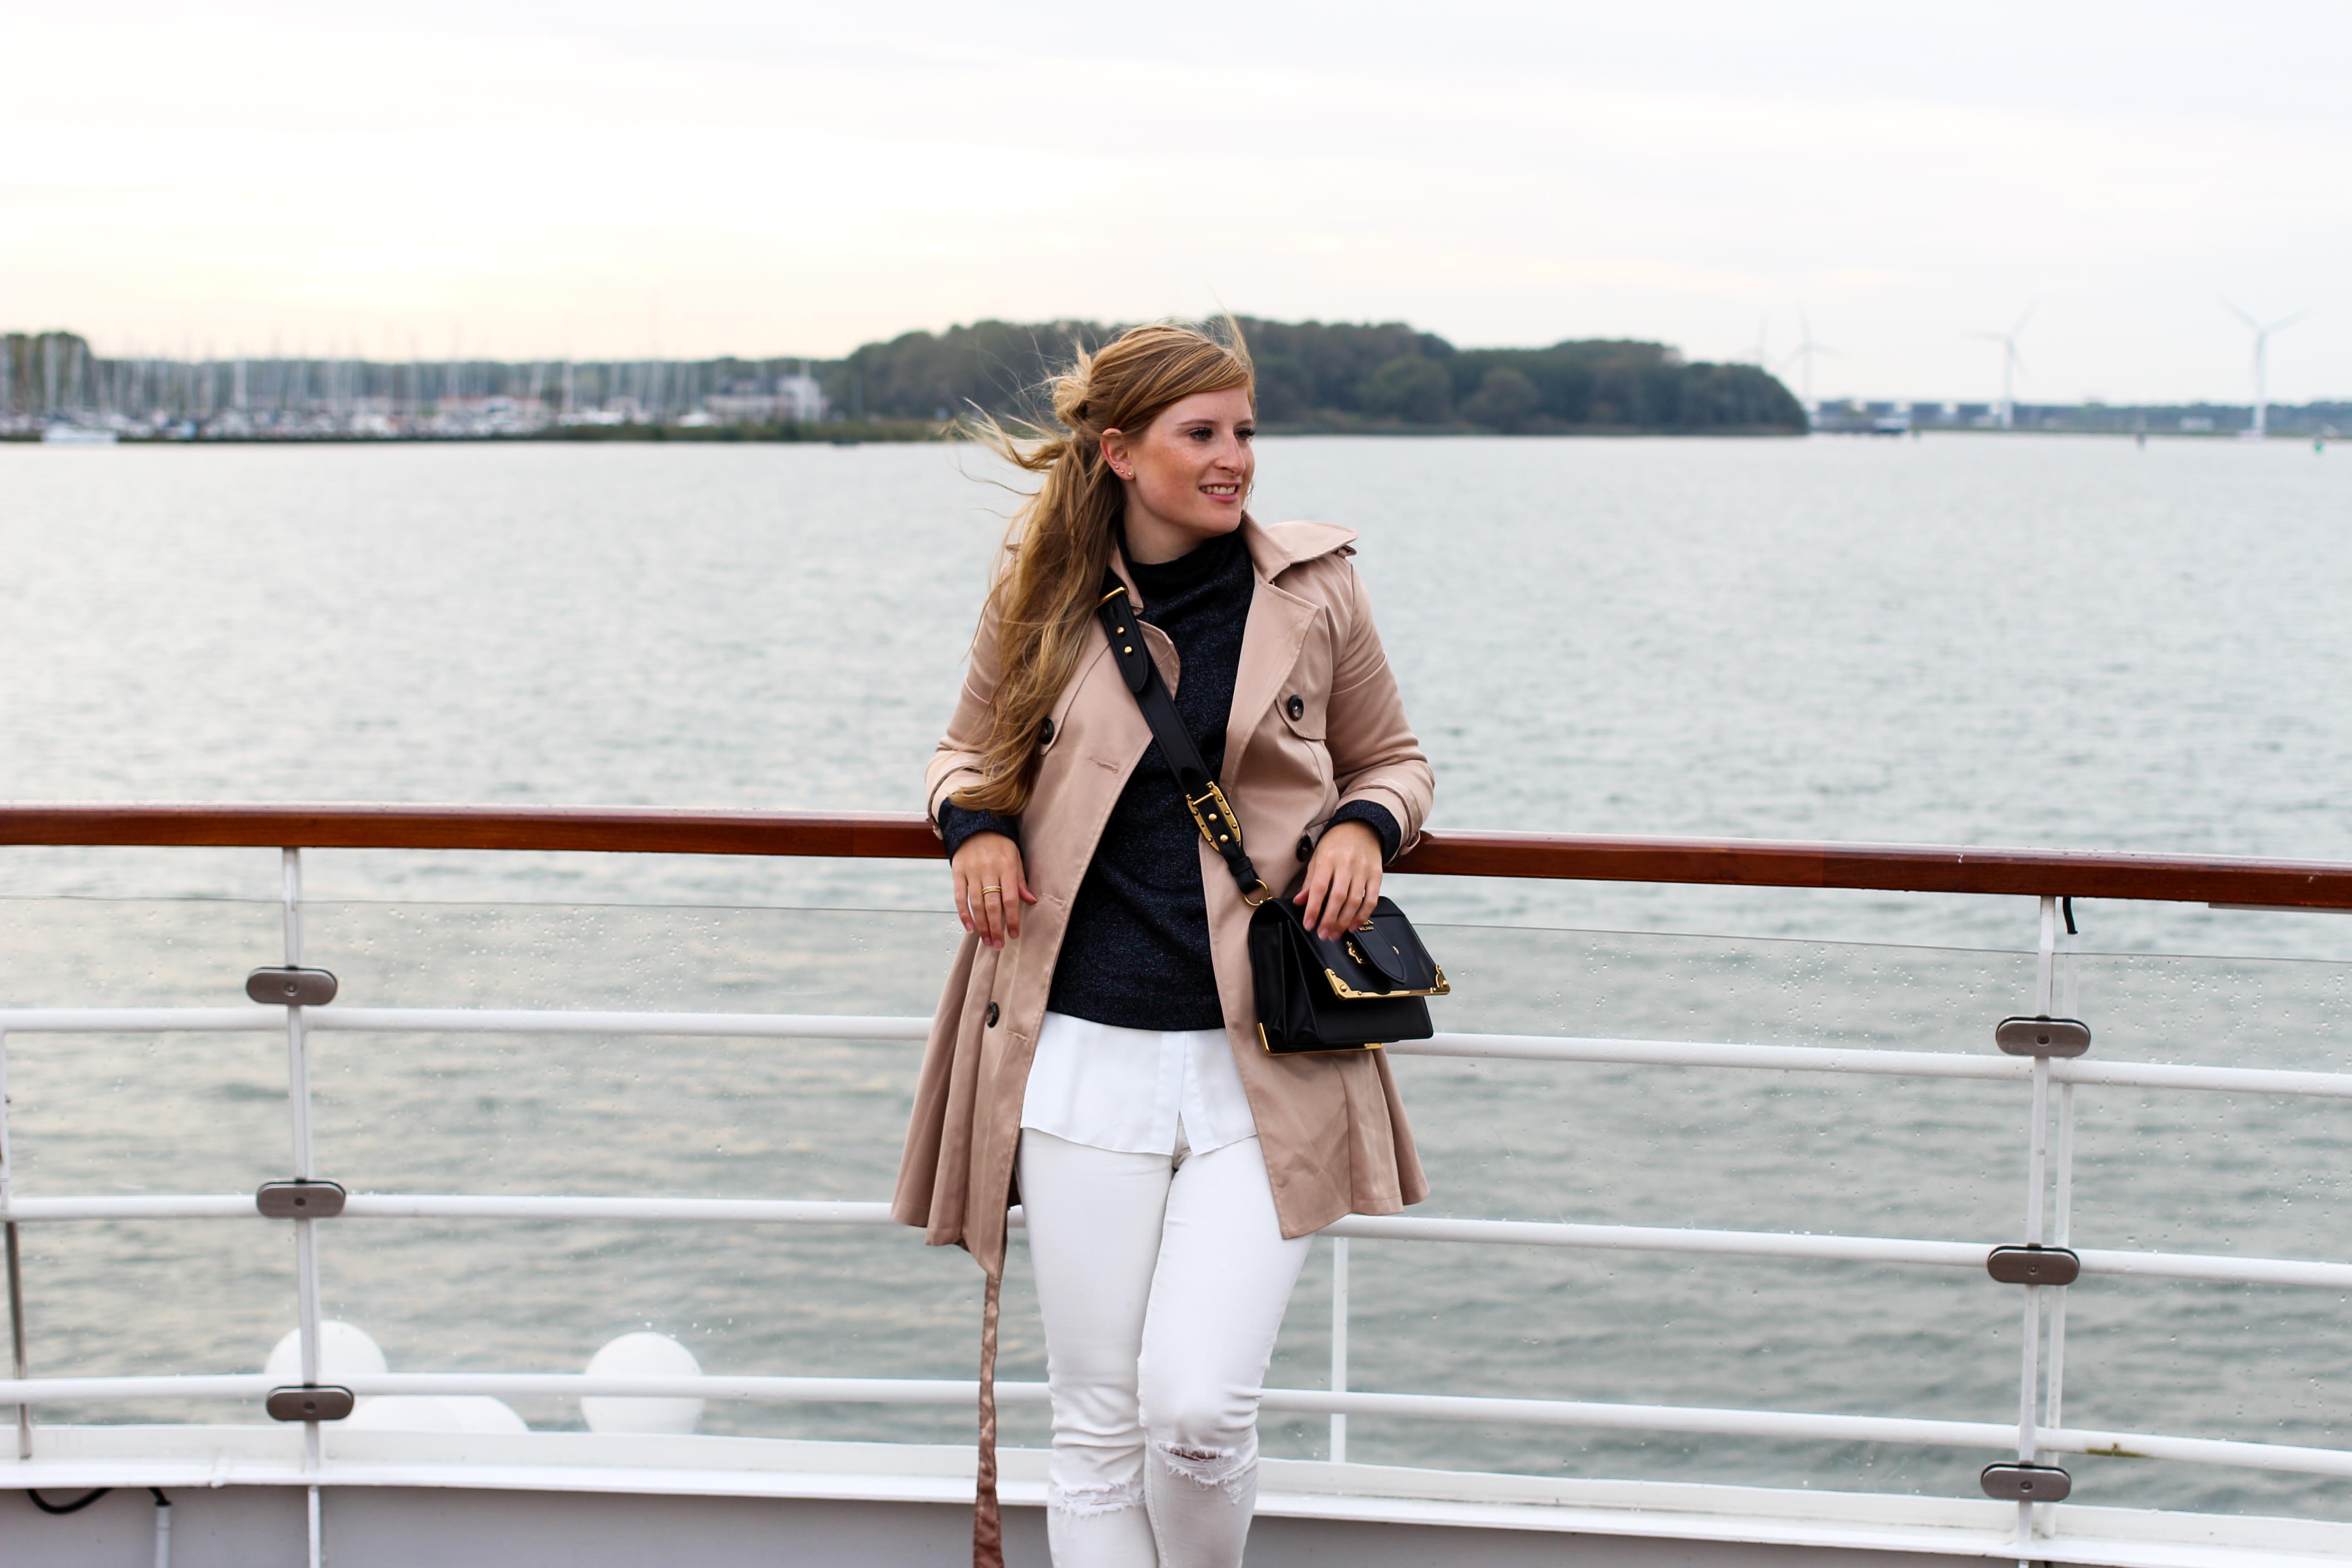 Flusskreuzfahrt A-ROSA SILVA Kreuzfahrtschiff Flusskreuzfahrt Reiseblog Brinisfashionbook